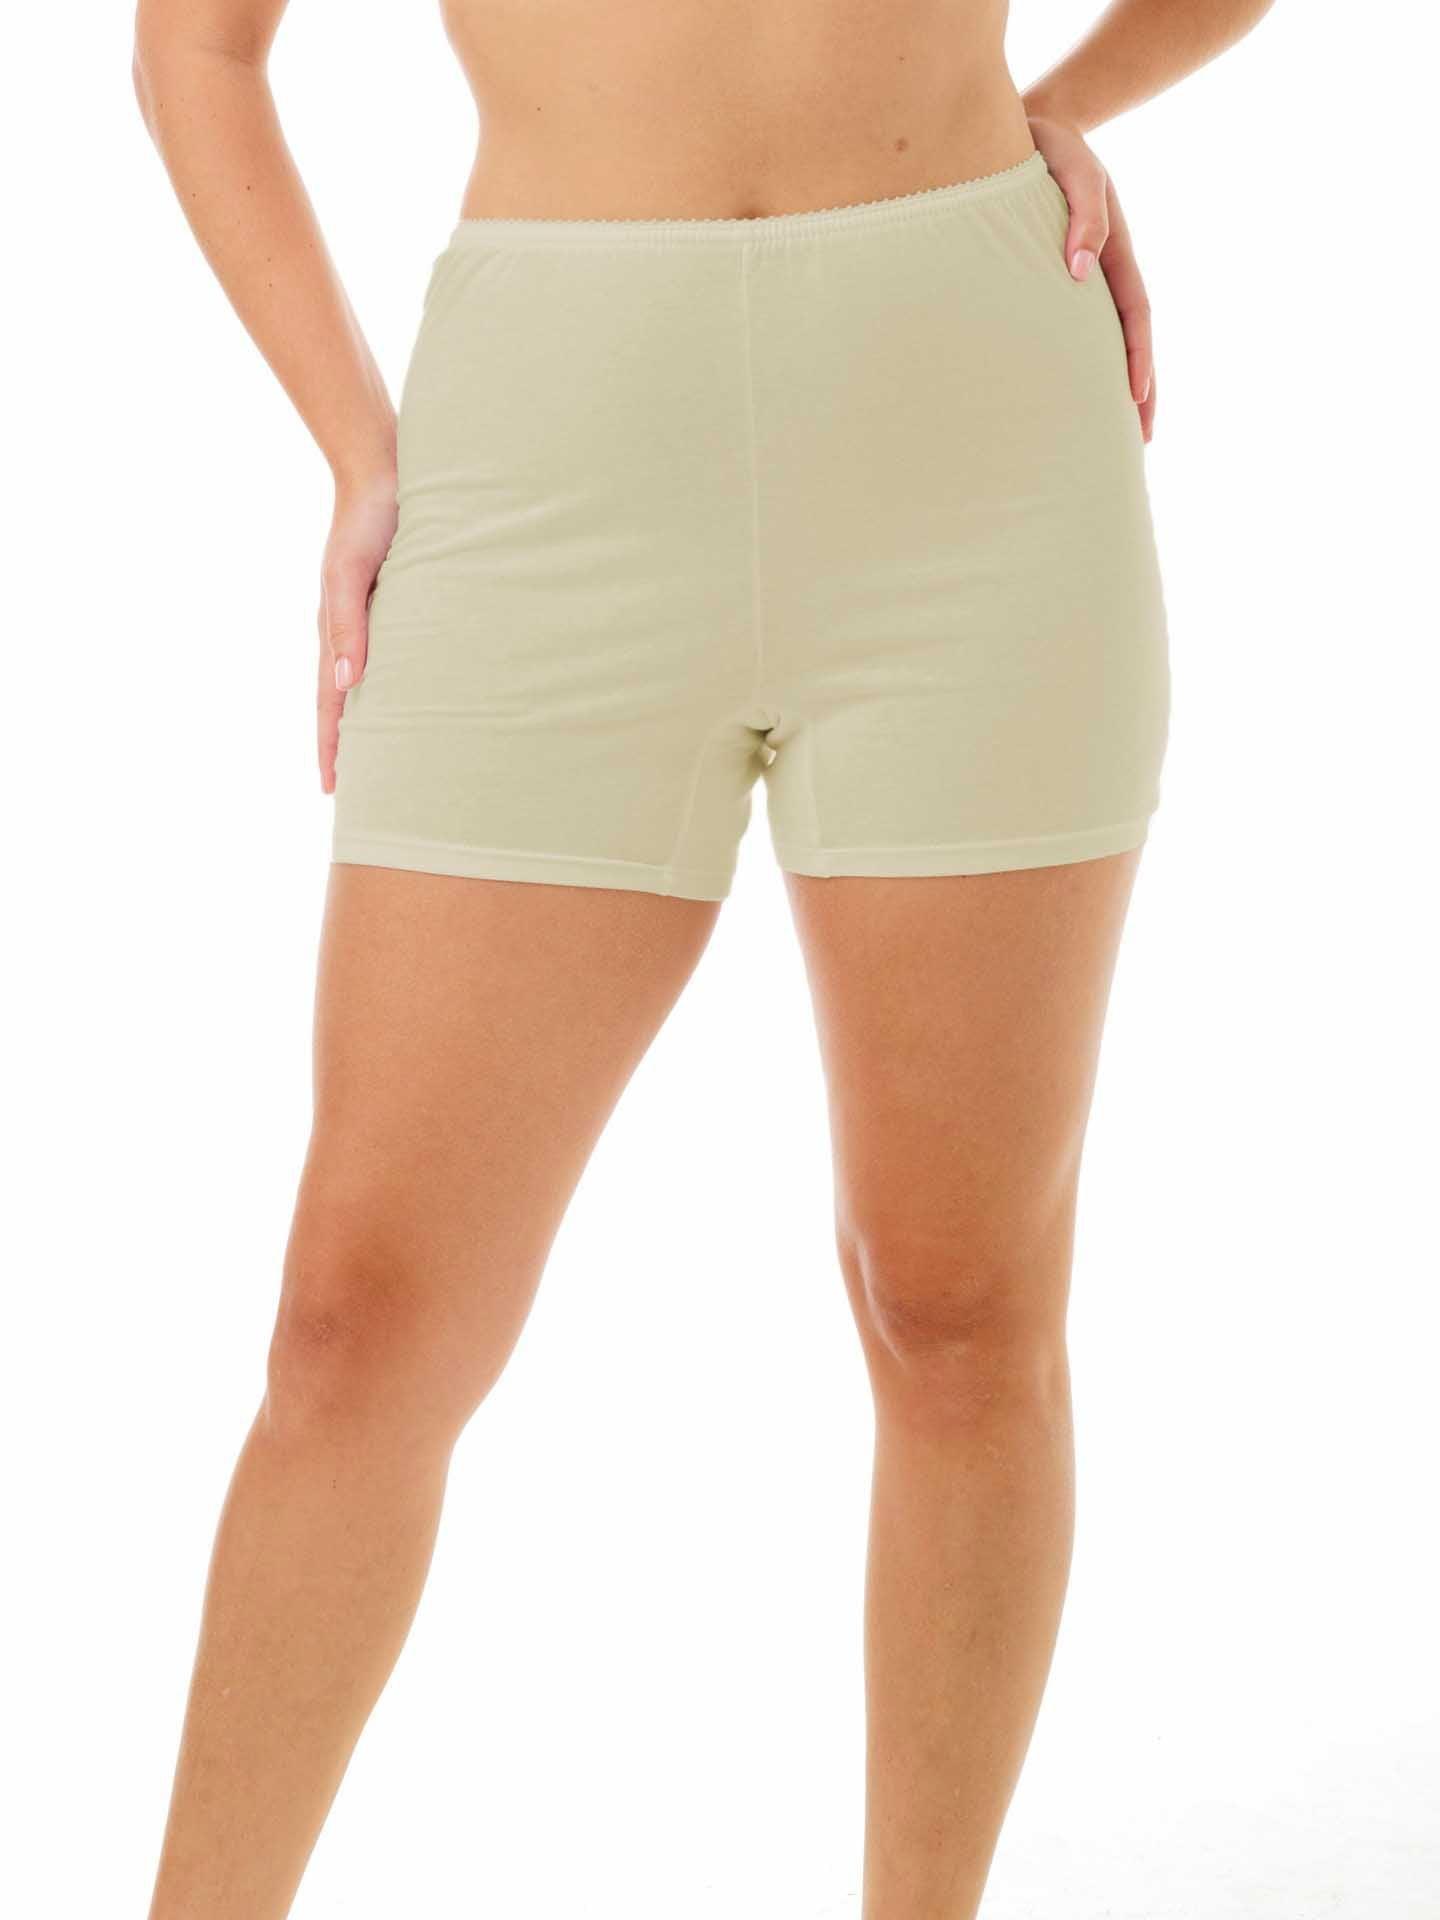 Women's Cotton Bloomers Trunk Leg Pants 5 Inch Inseam 16 & 20 inch Length